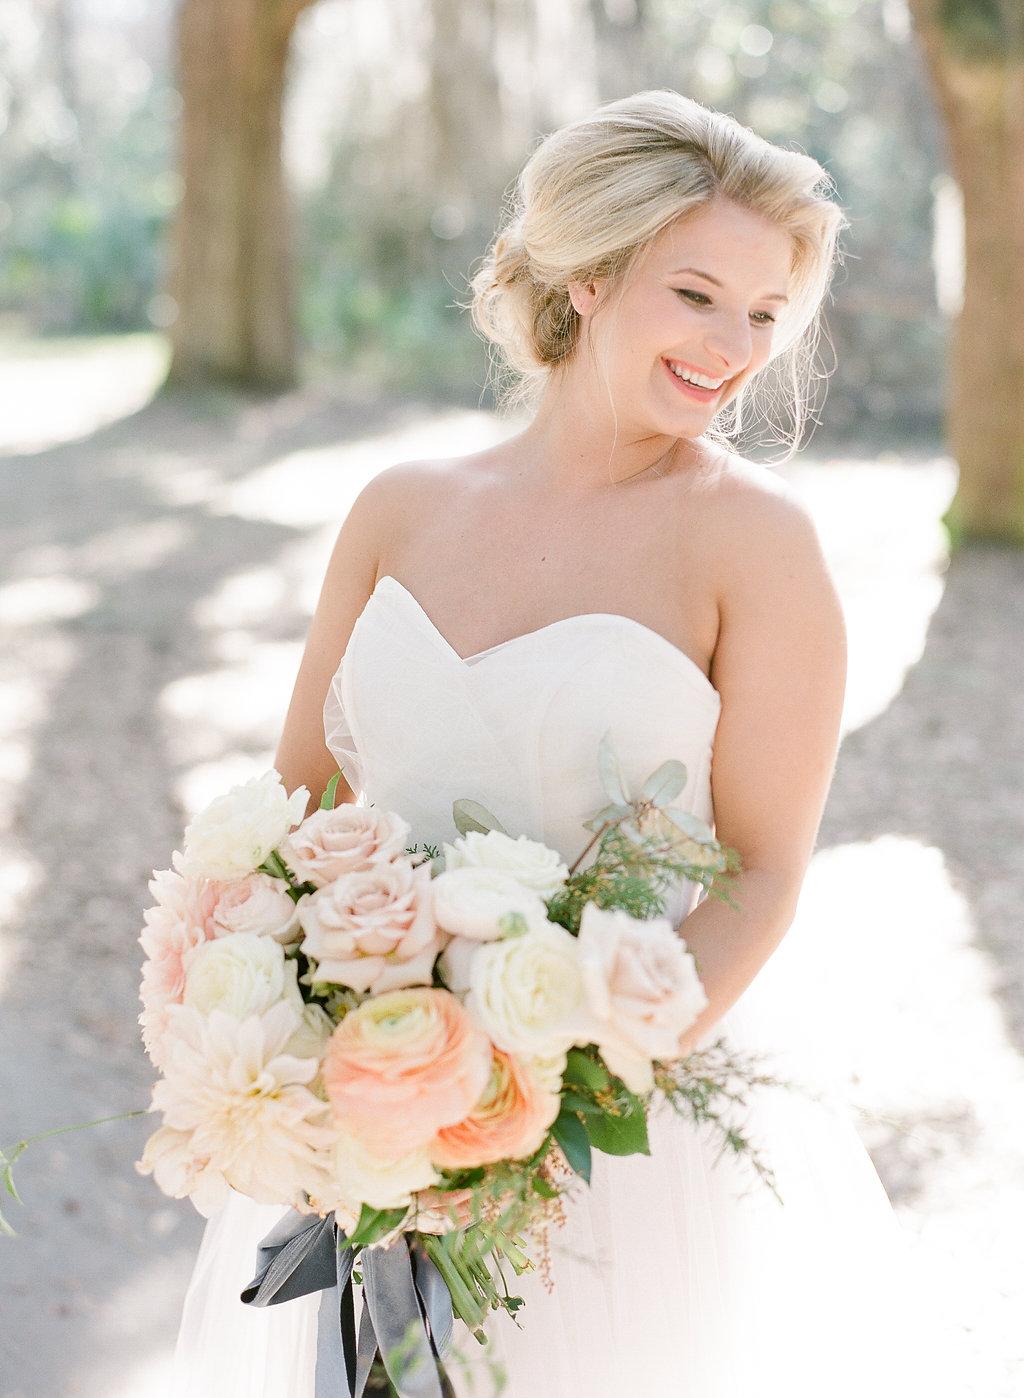 the-happy-bloom-wormsloe-wedding-savannah-wedding-ivory-and-beau-bridal-boutique-savannah-wedding-dresses-savannah-bridal-boutique-georgia-bridal-boutique-design-studio-south-sunset-wedding-blush-by-hayley-paige-candi-1550-blush-wedding-dress-10.jpg